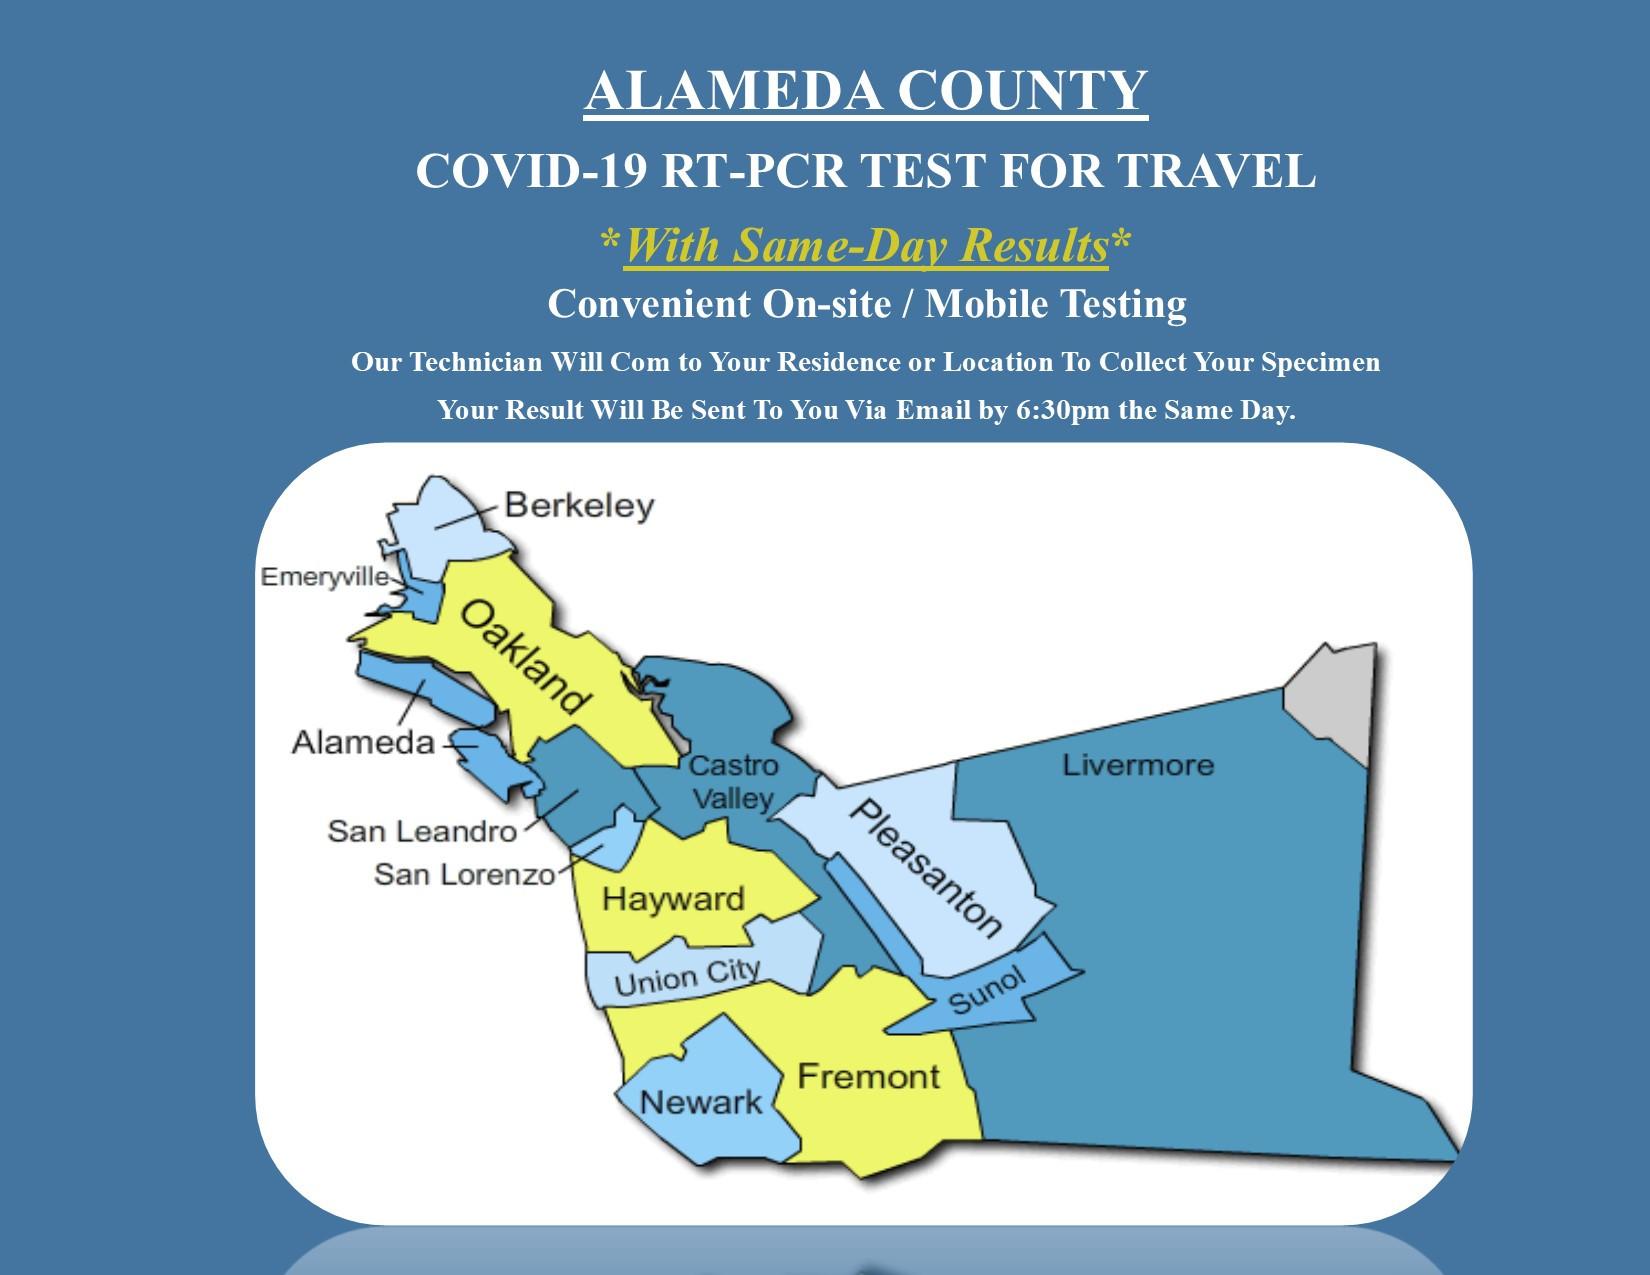 Covid-19 RT-PCR Test: Alameda County